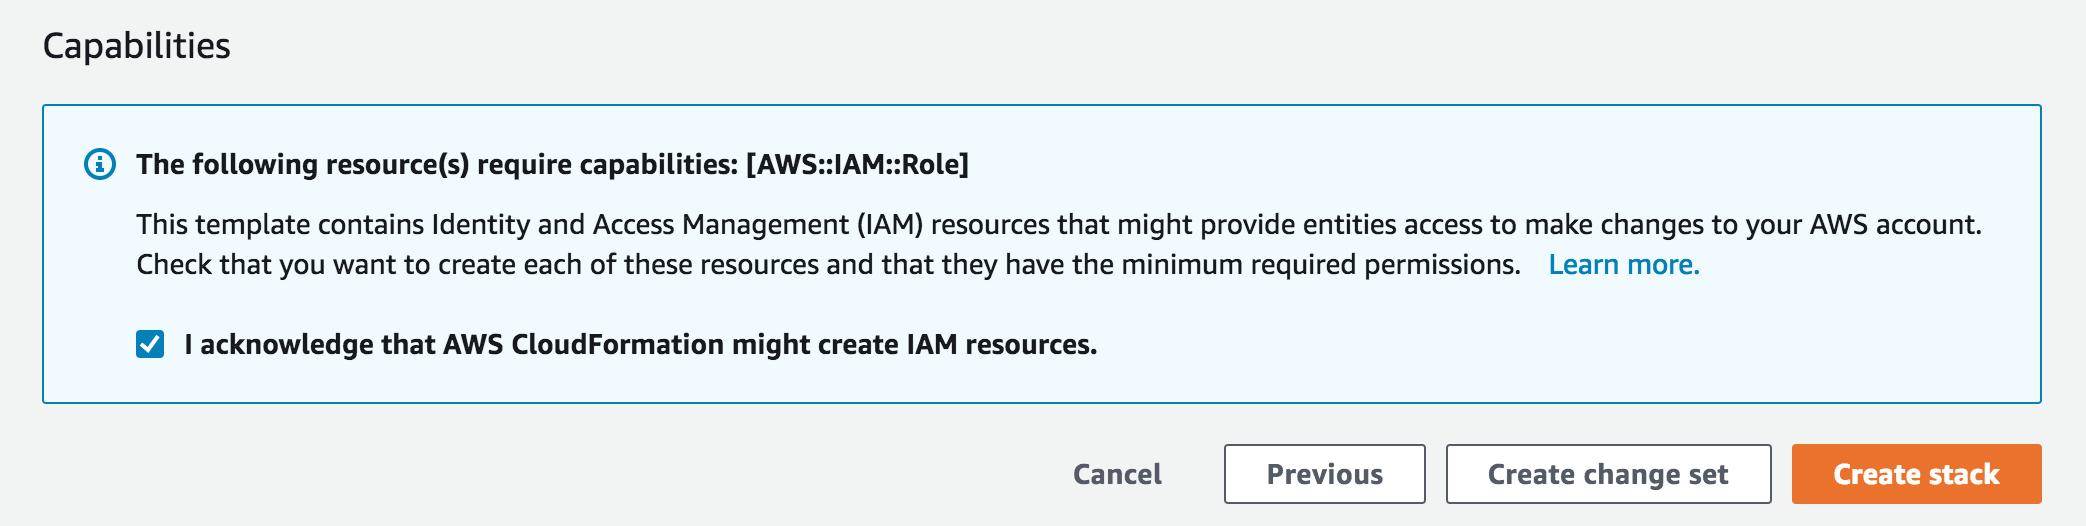 IAM resources acknowledgement